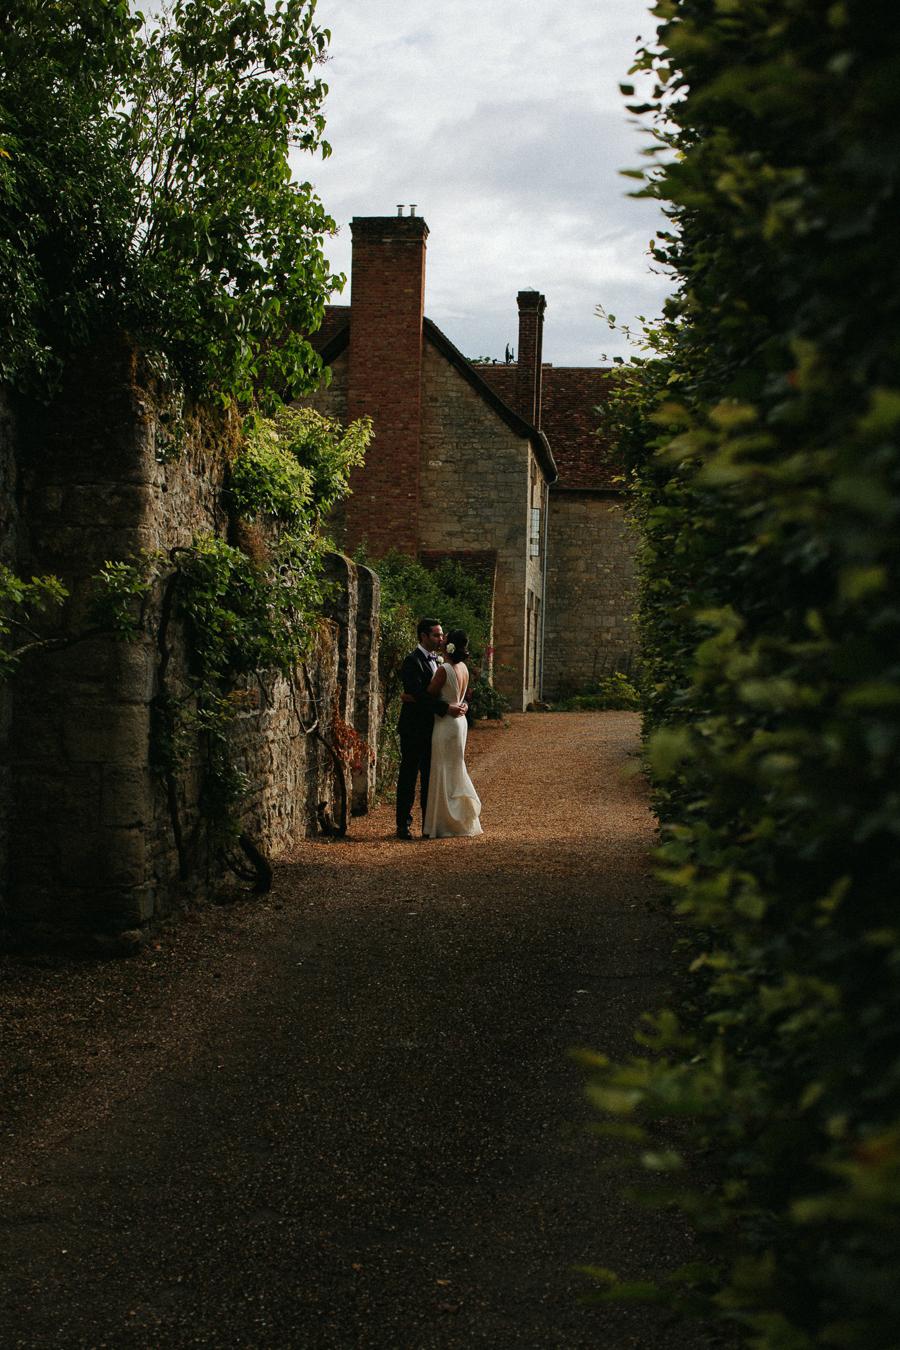 Notley-abbey-buckinghamshire-england-wedding-abi-q-photography--186.jpg